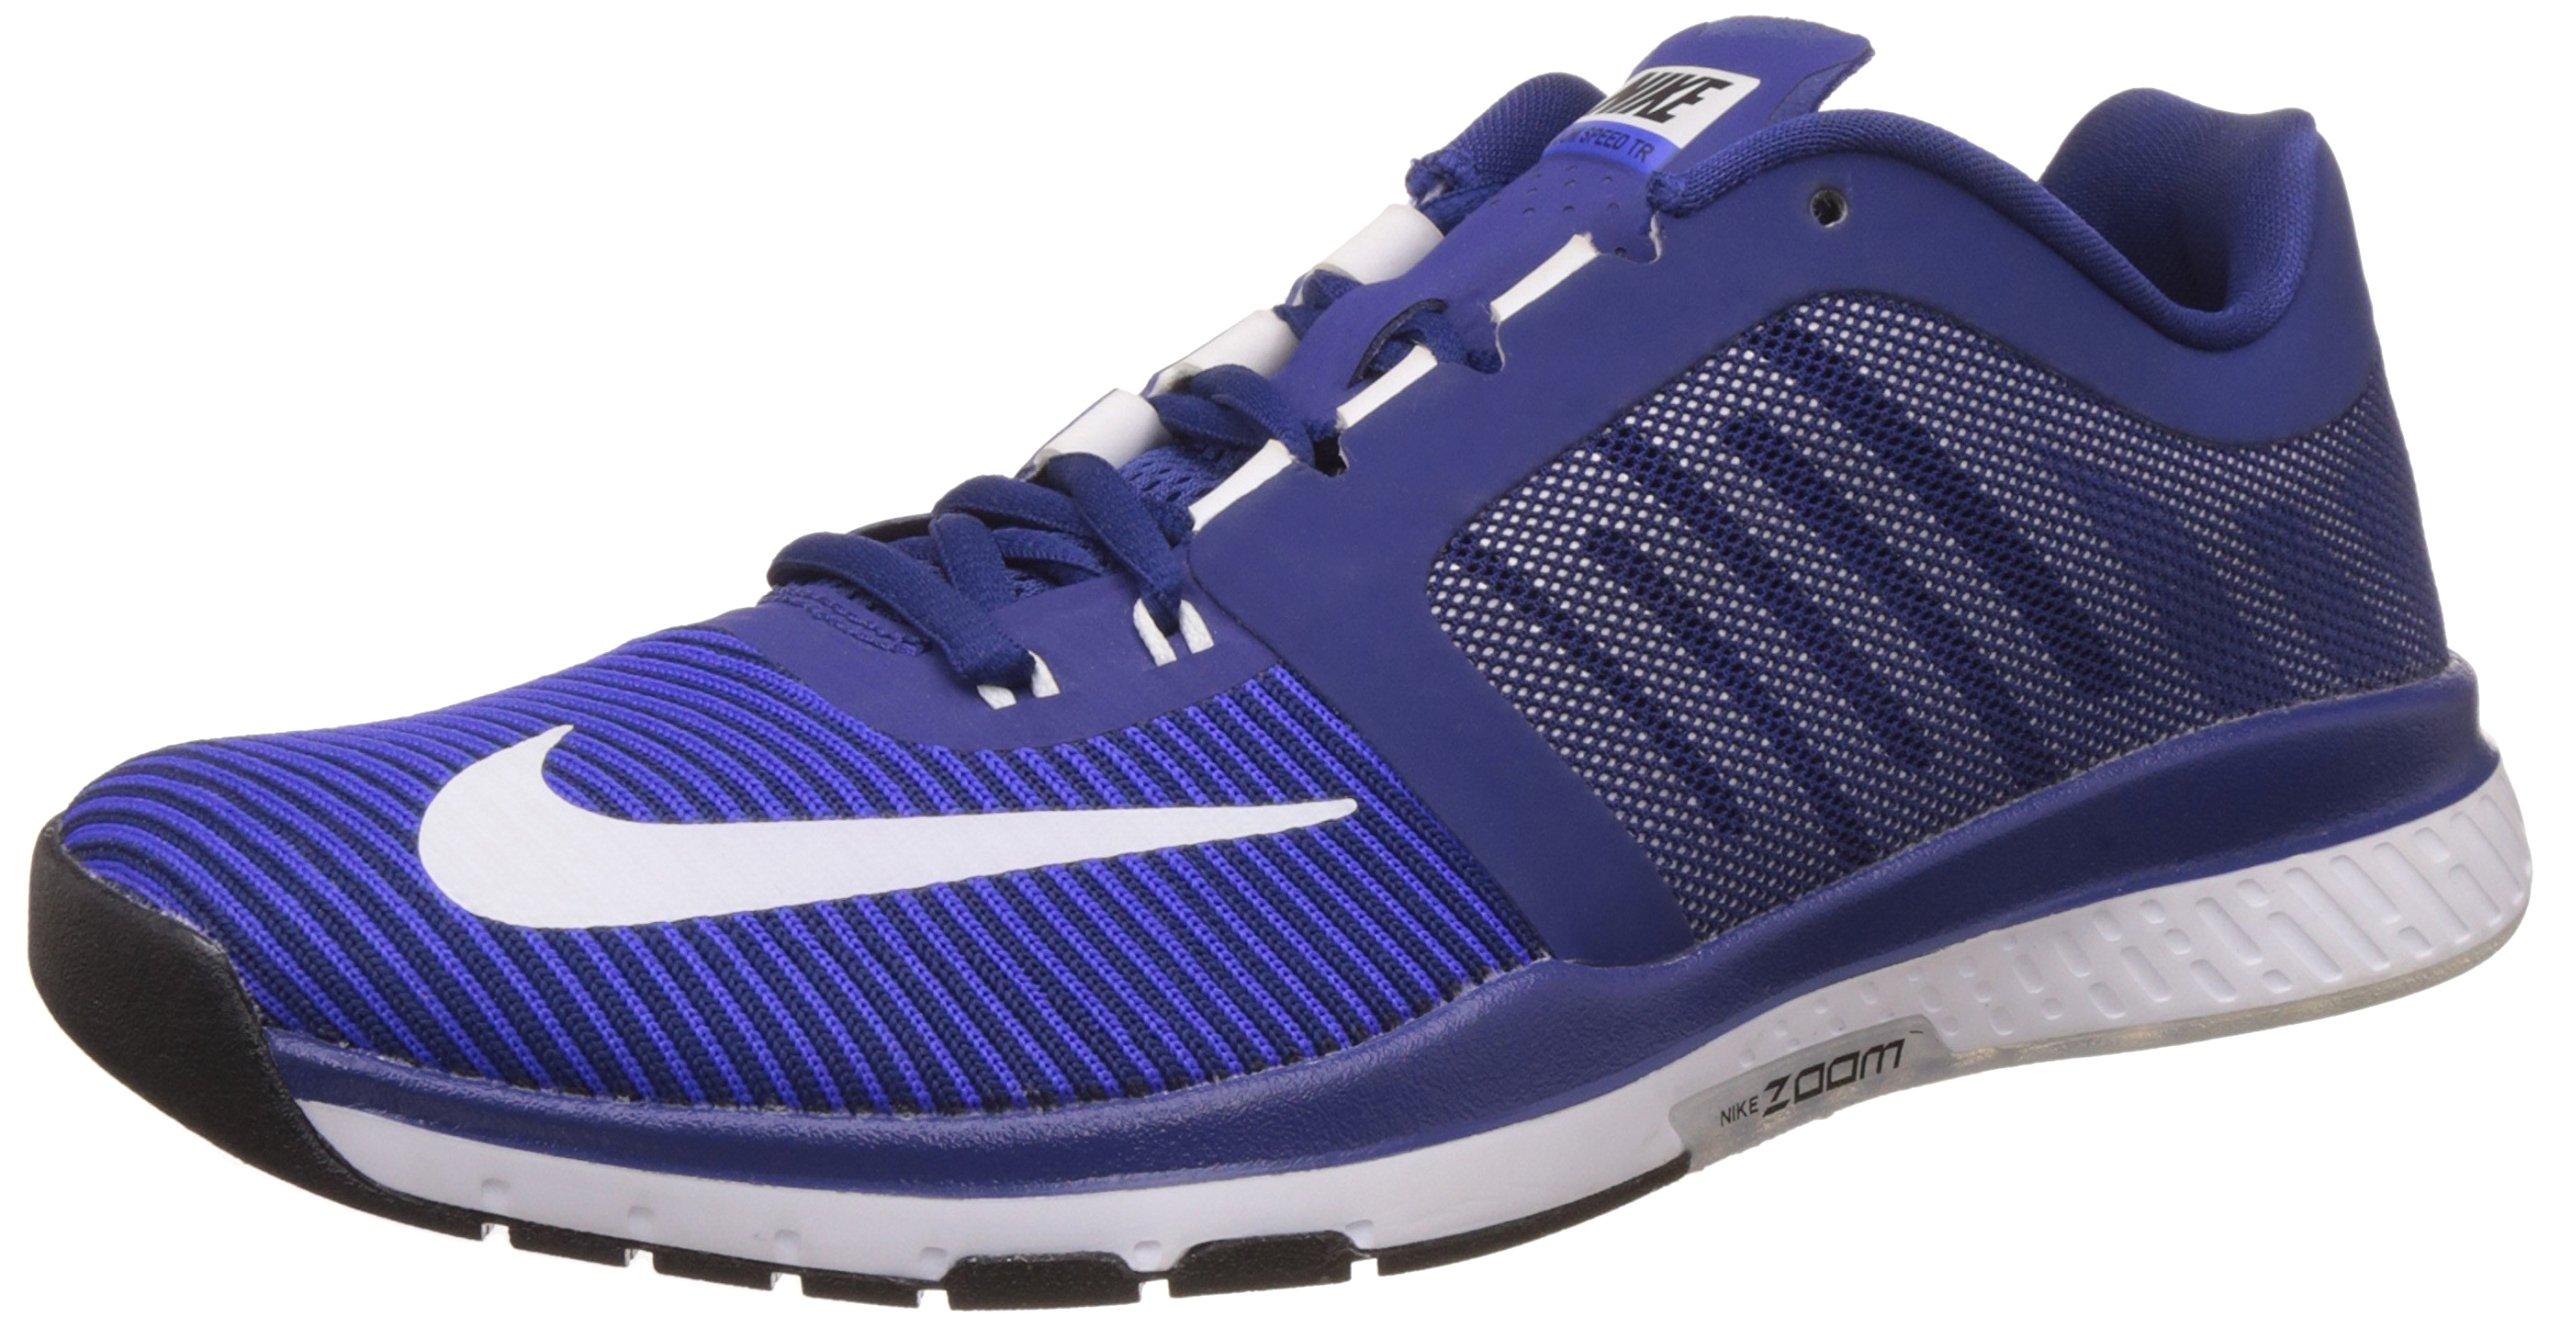 b434aa0da9417 Galleon - Nike Men s Zoom Speed TR3 Dp Royal Blue White Rcr Bl Blk Training  Shoe 8.5 Men US